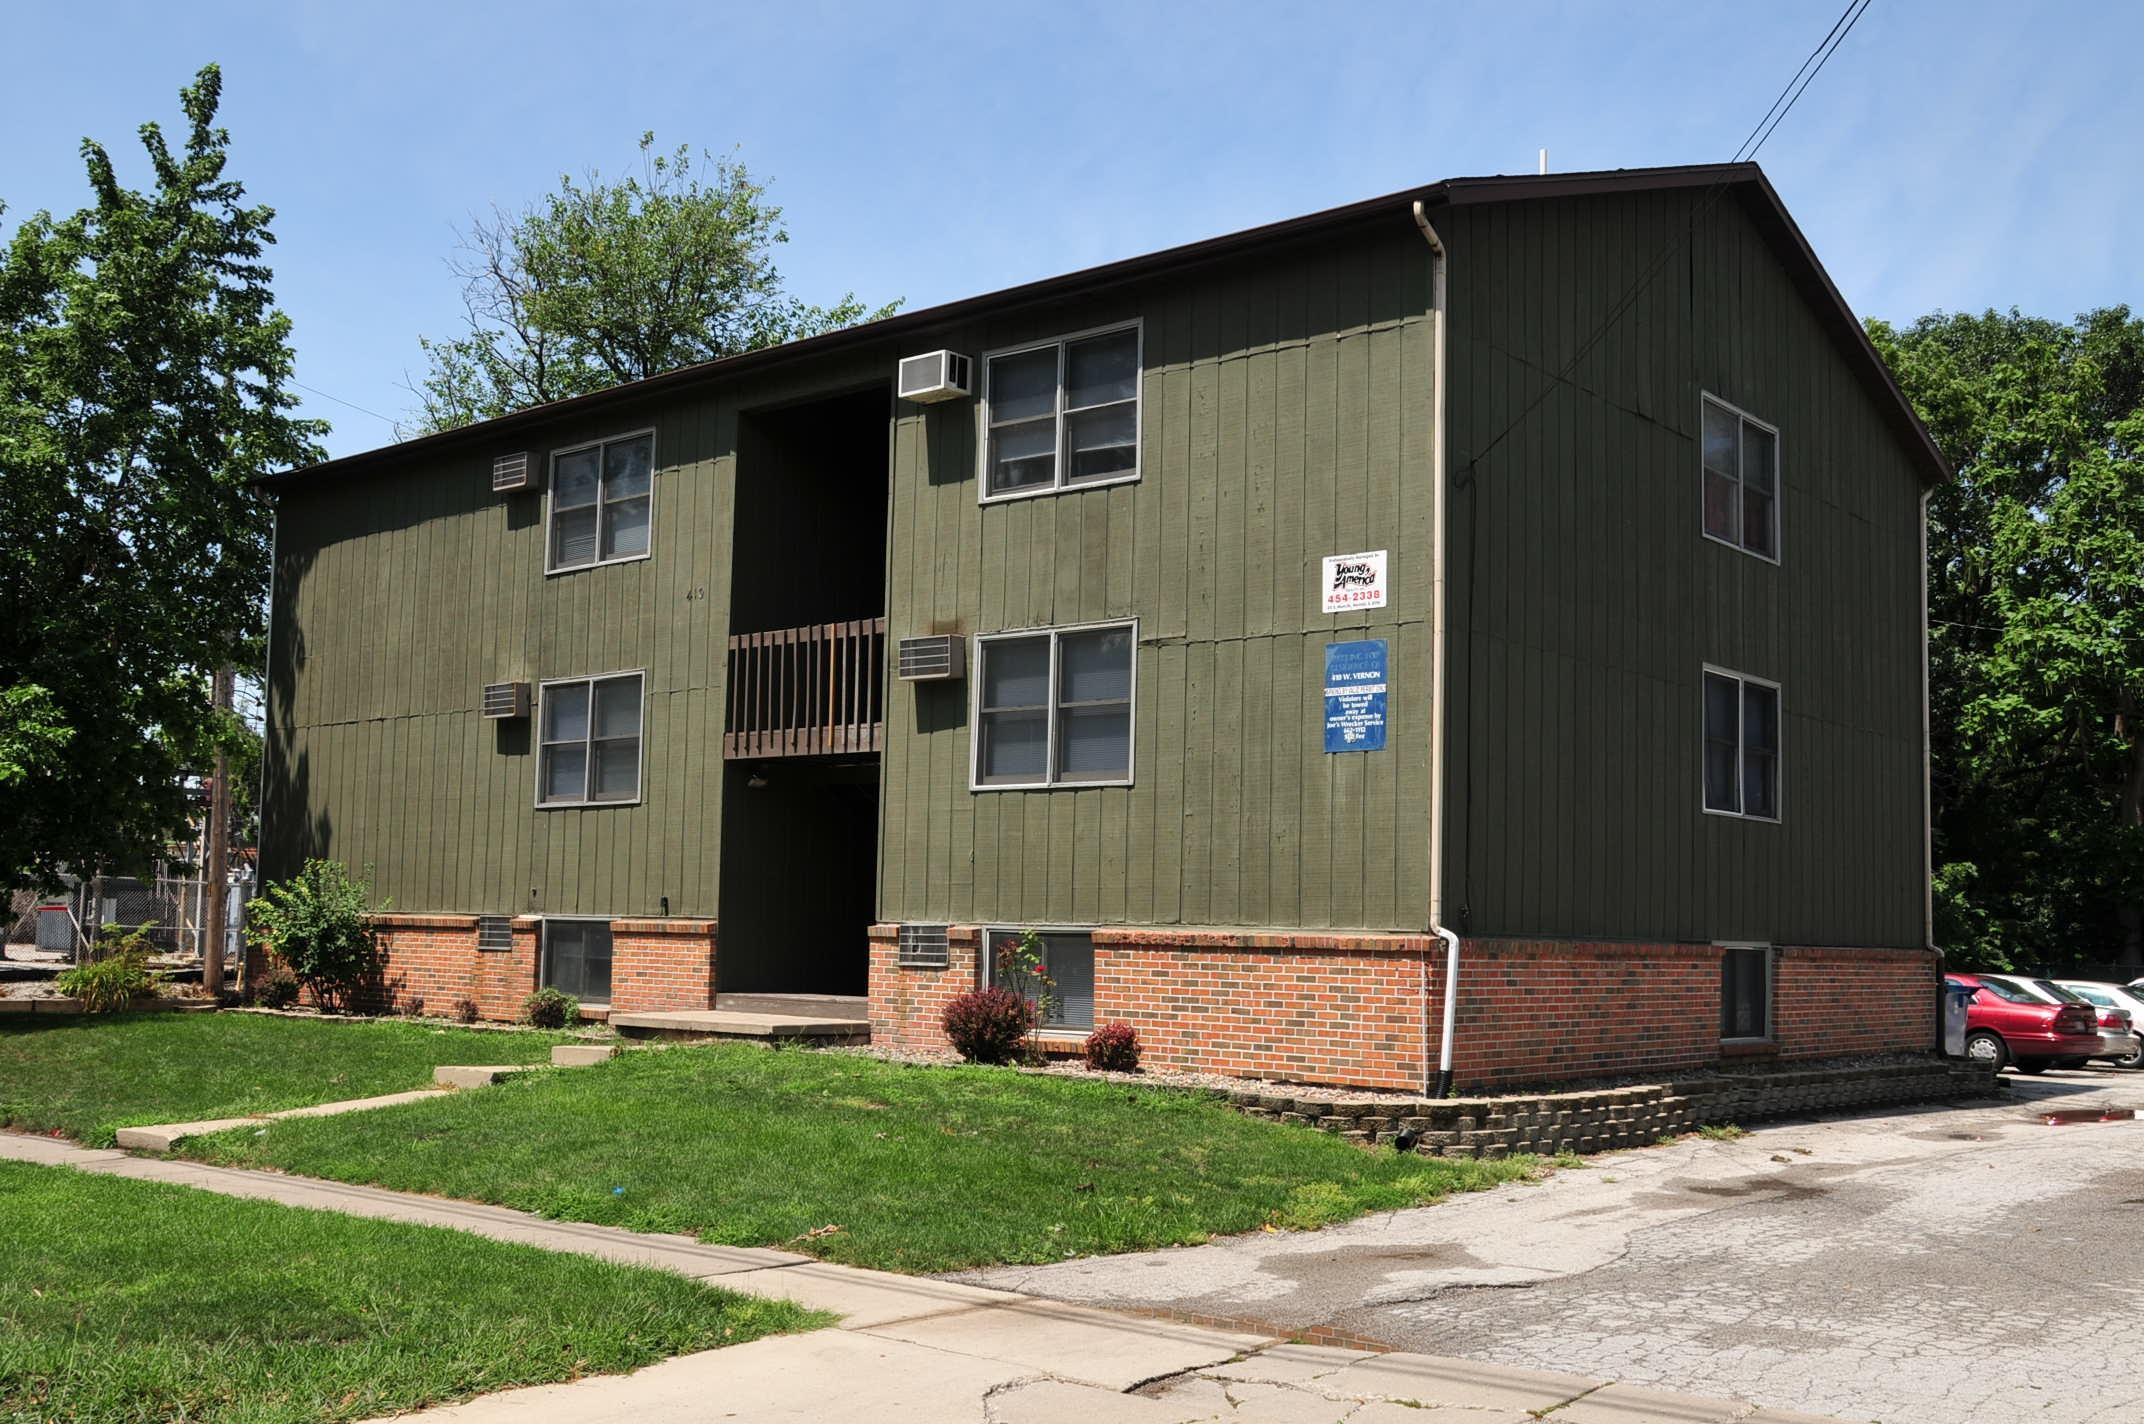 Kitchen Cabinets Peoria Il 410 W Vernon Apartments For Rent 410 W Vernon Ave